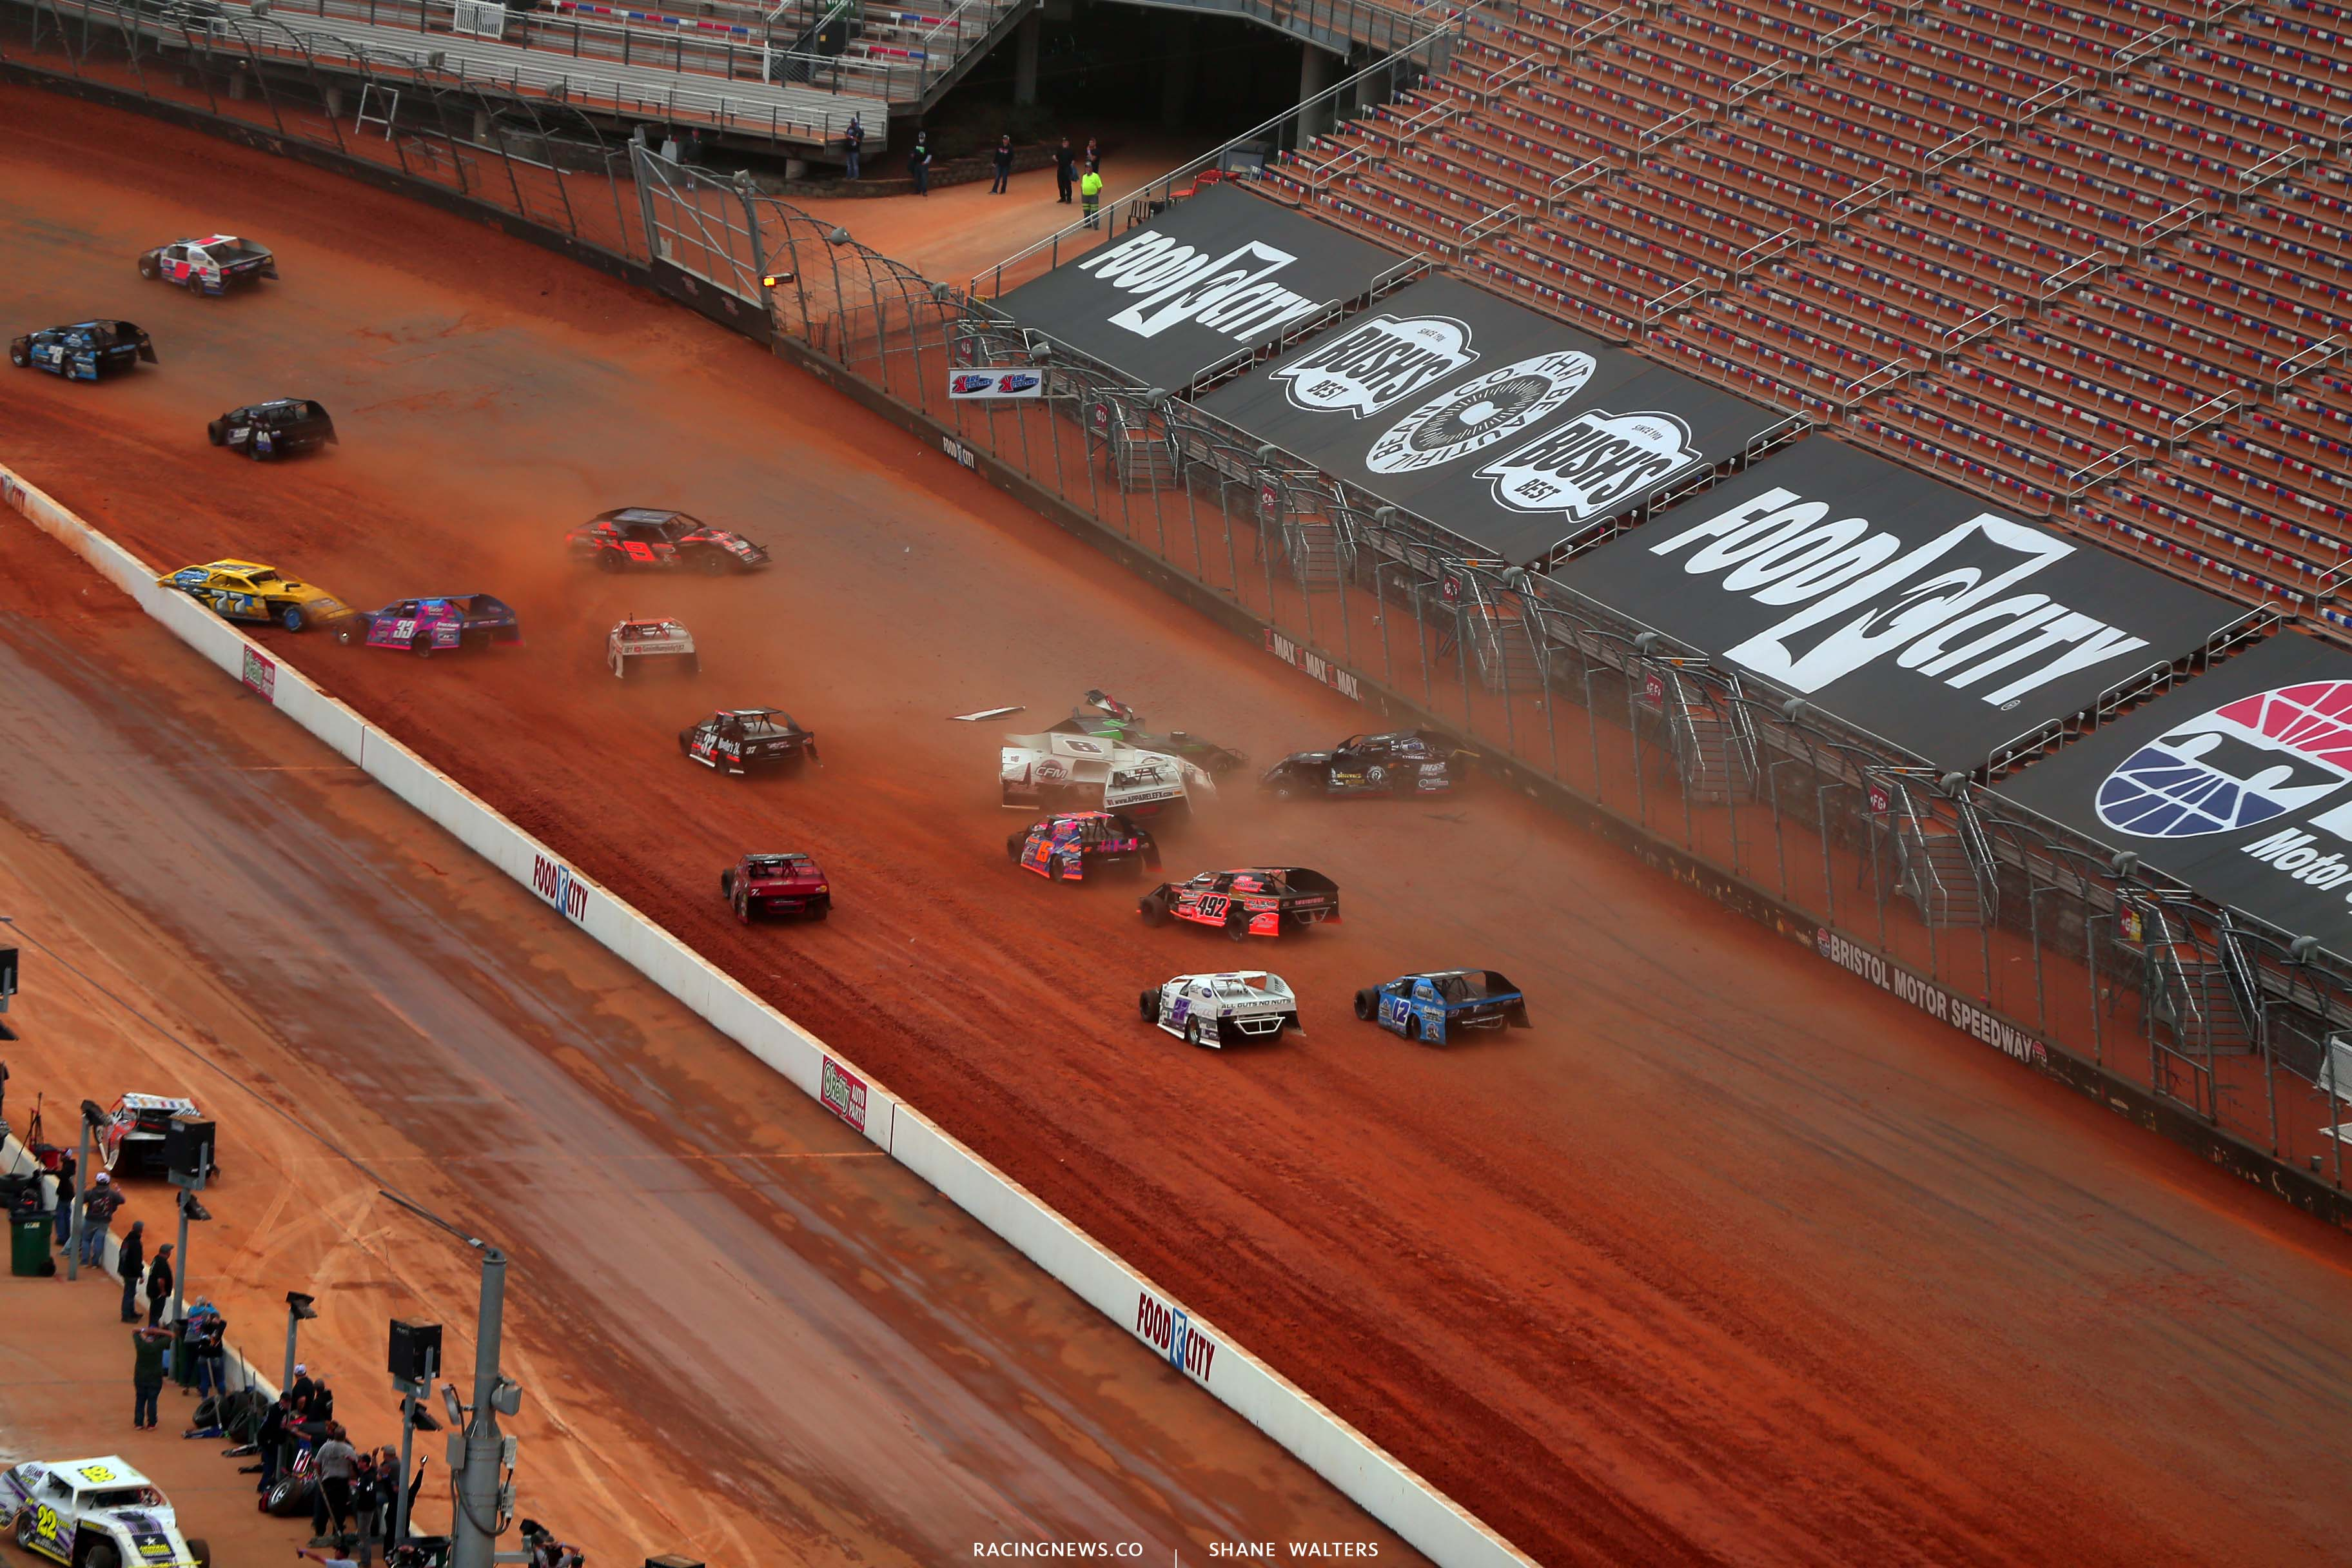 R - Dirt modified crash at Bristol Motor Speedway dirt track